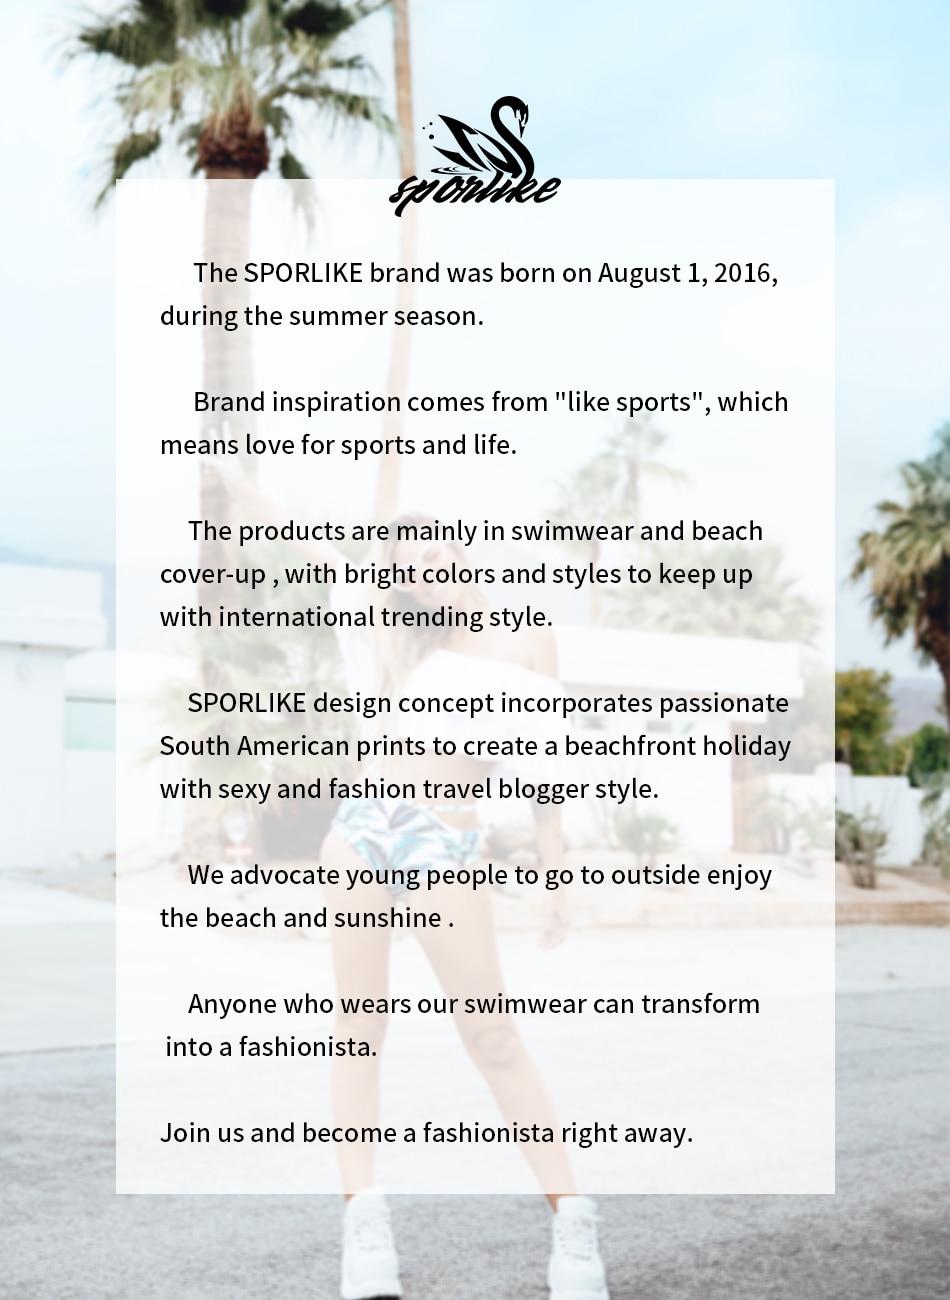 HTB1jh4wPrvpK1RjSZFqq6AXUVXa2 2019 Sexy Black White Bikini Swimwear Women Swimsuit Brazilian Bikini Set Halter Top Beach wear Bathing Suits Biquini female